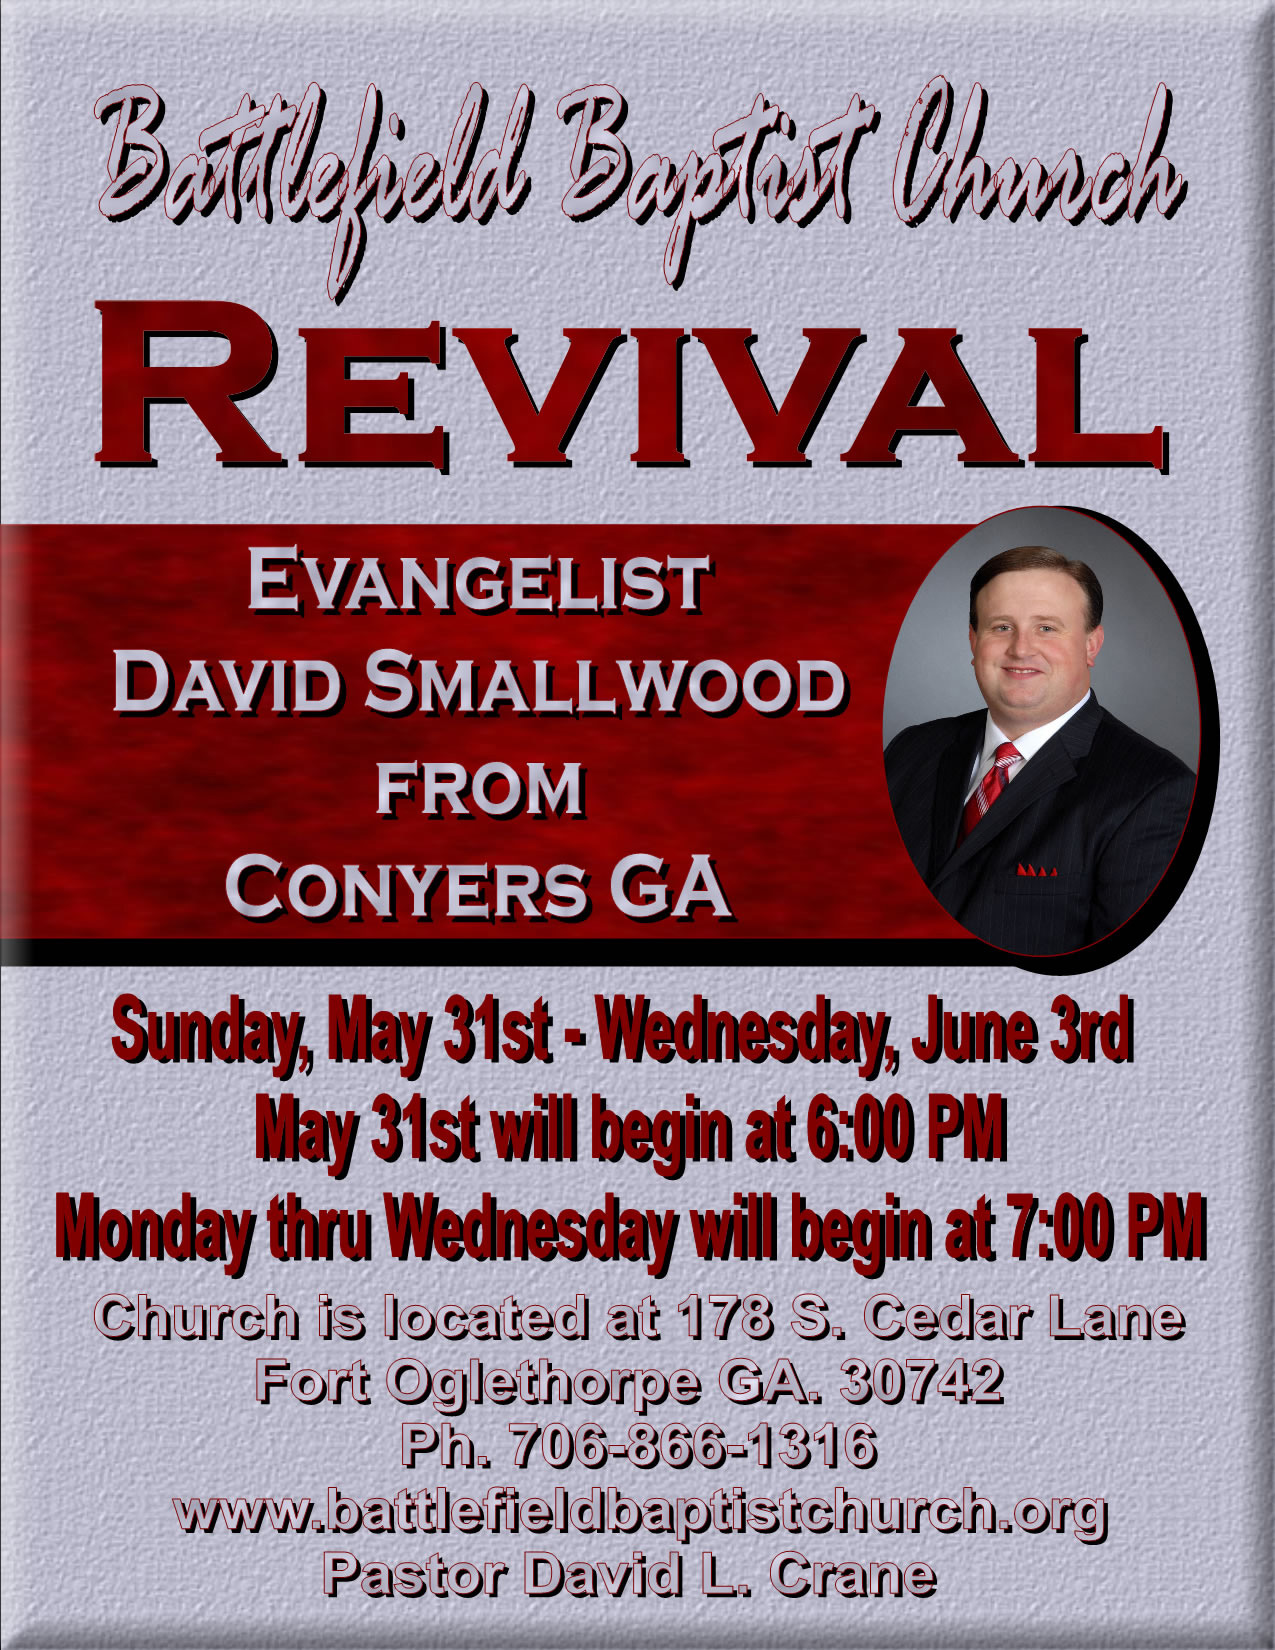 Revival 2009